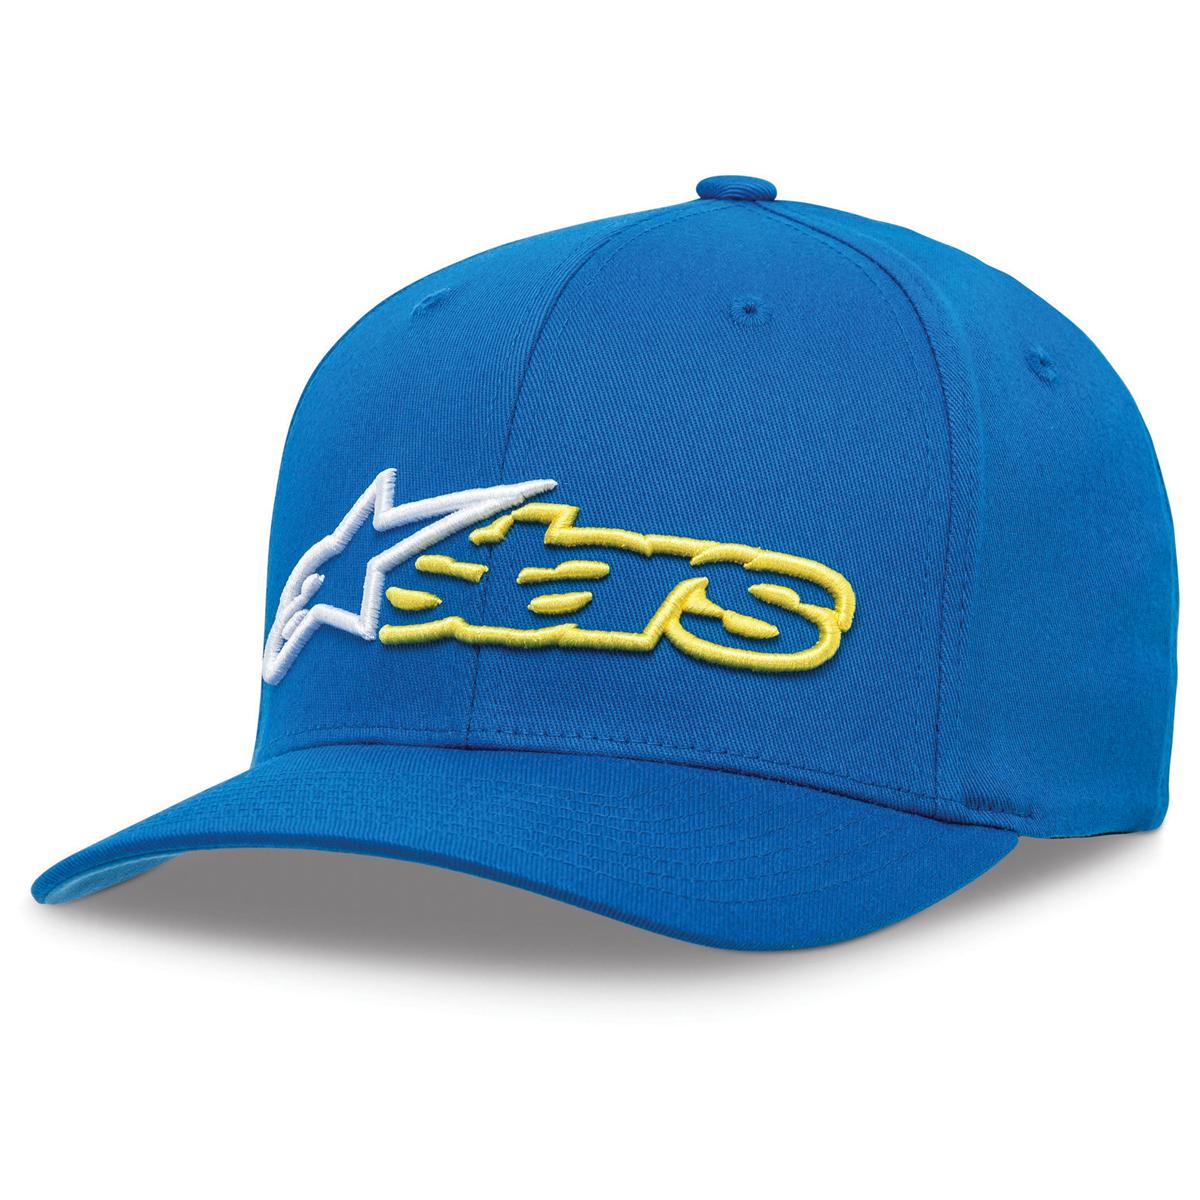 Alpinestars Reblaze Blue/White Curved Bill Hat